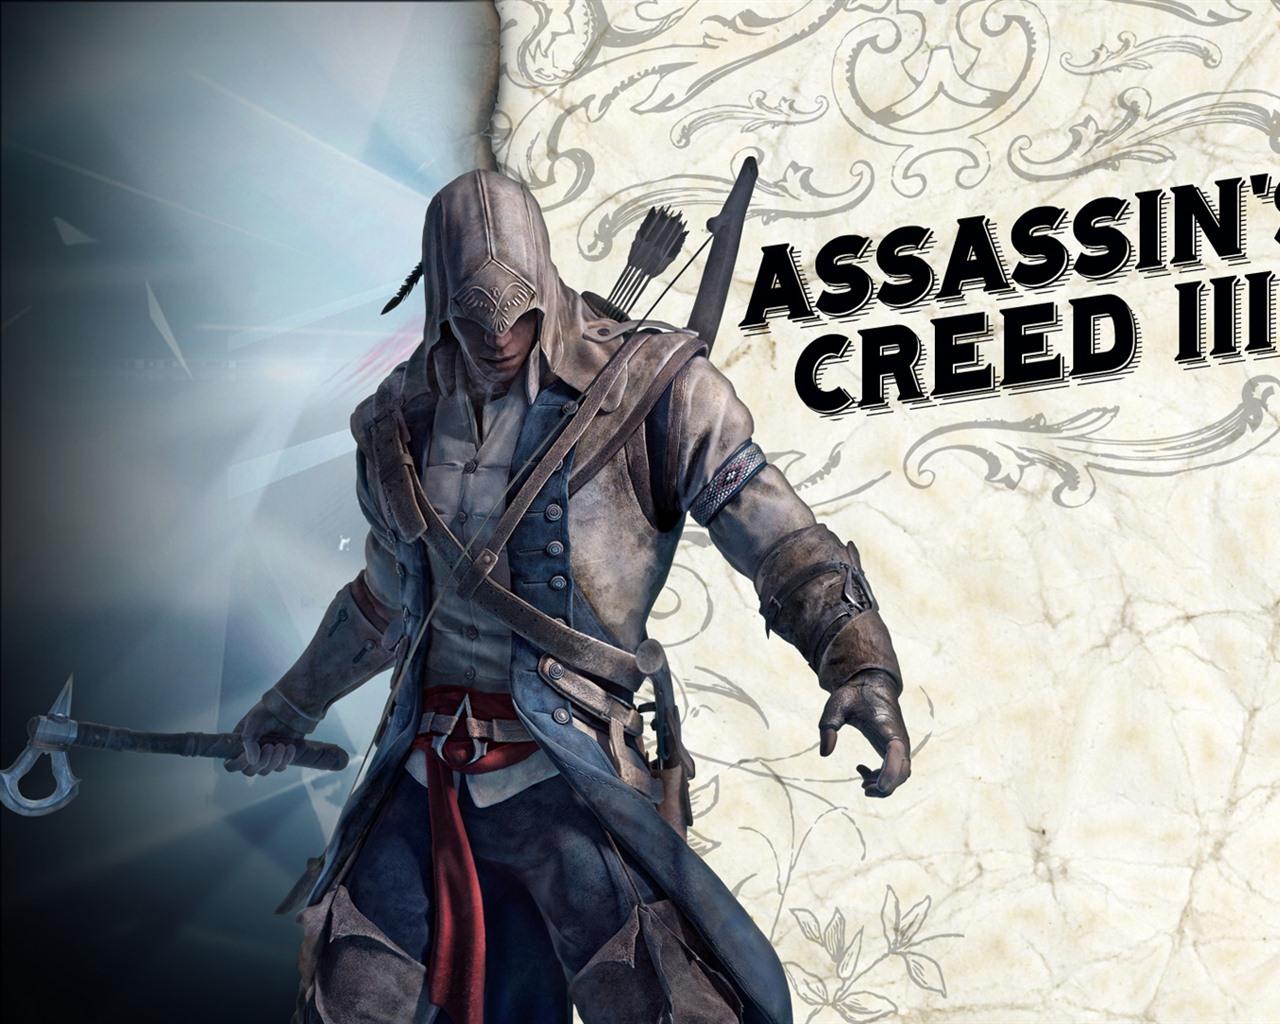 Assassins Creed 3 Wallpaper 1280x1024 assassins creed iii 1280x1024